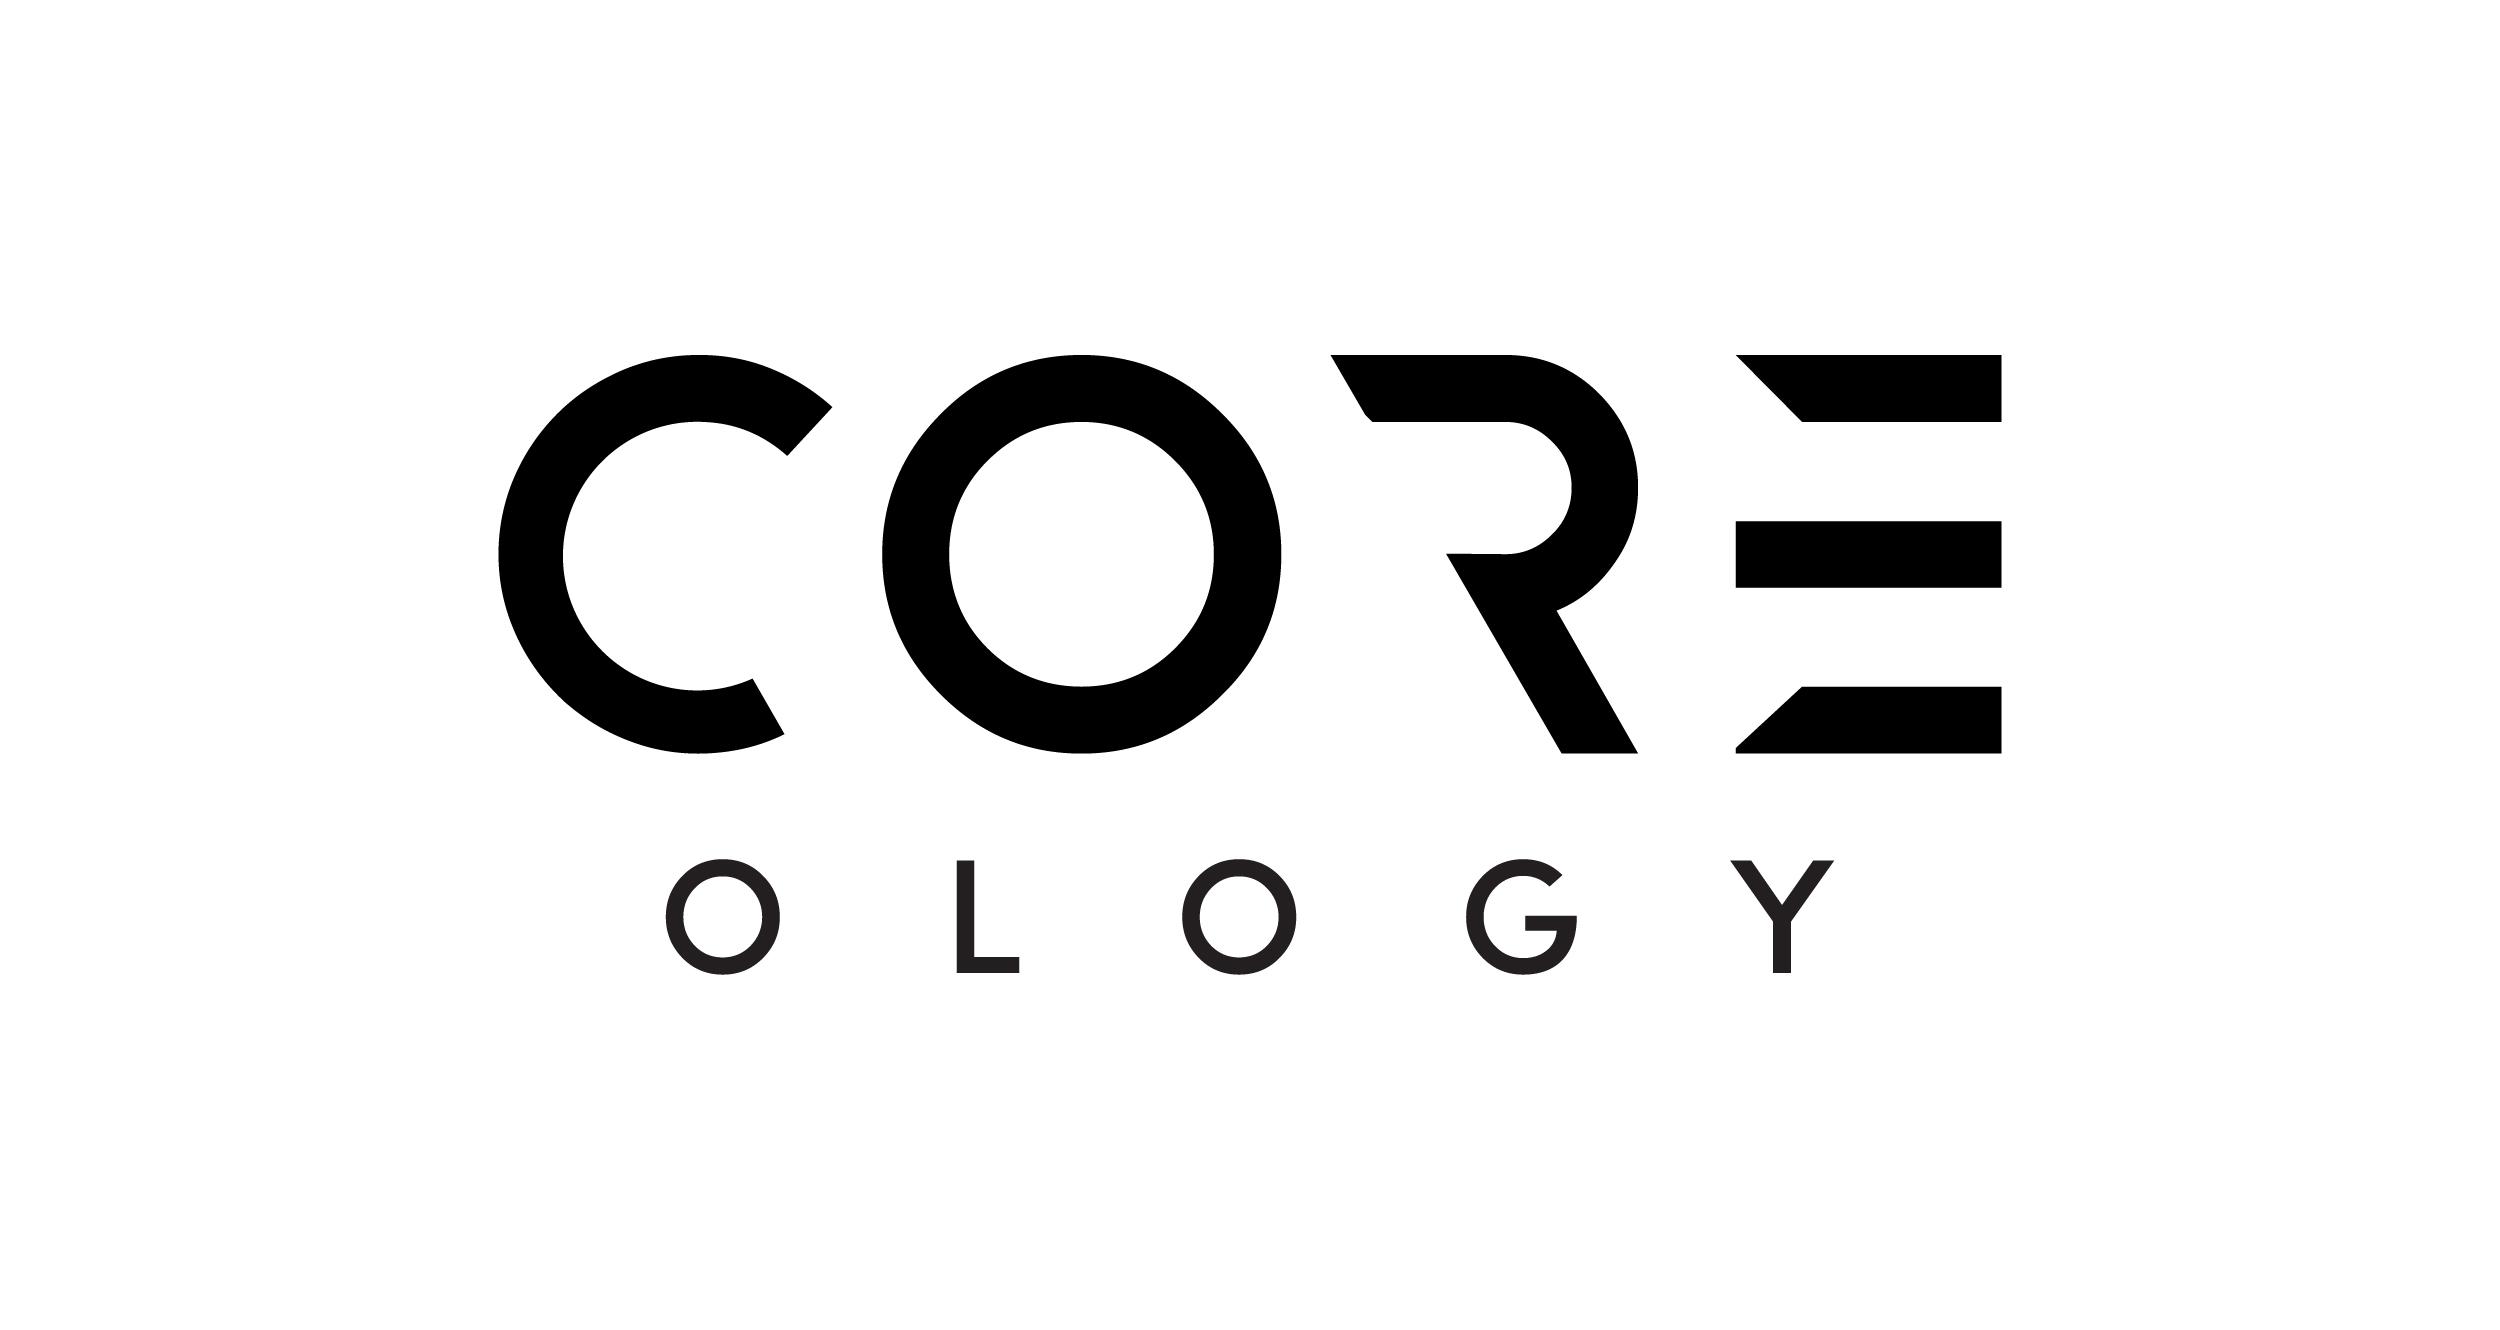 Secondary logo (vertical, positive).